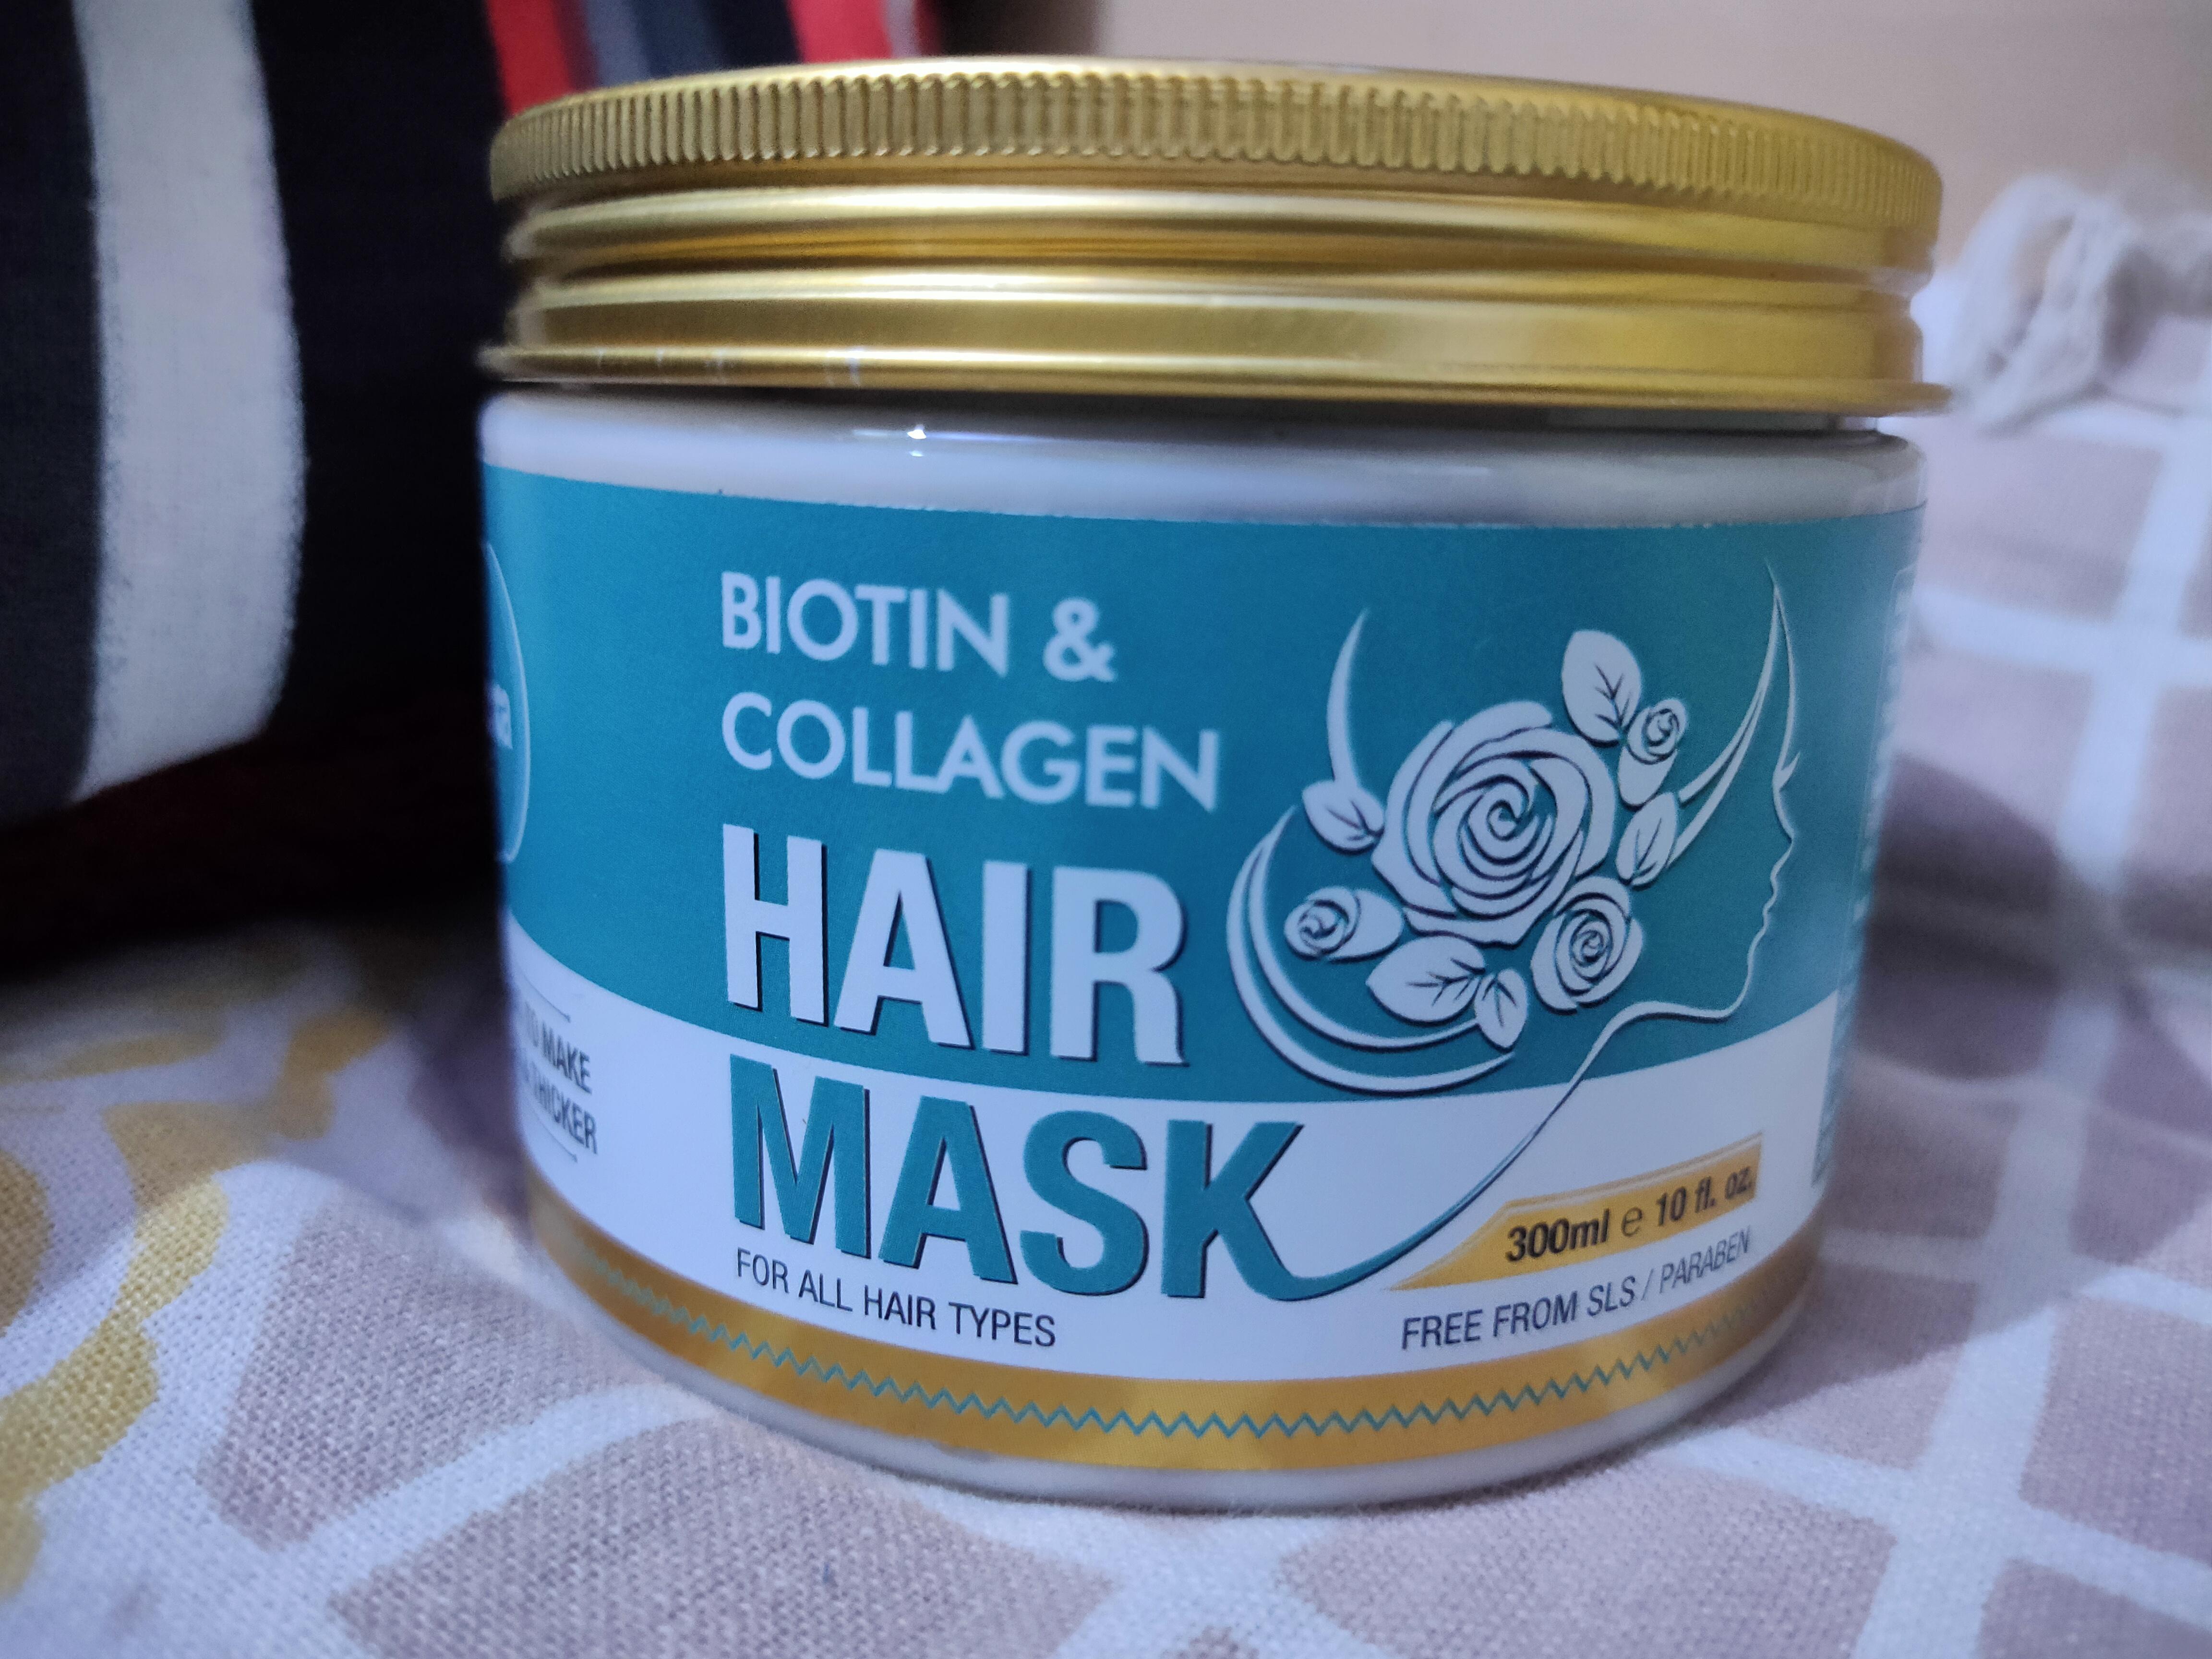 St.Botanica Biotin & Collagen Hair Mask pic 1-Best Hair Mask ever!!-By kirti_sameer